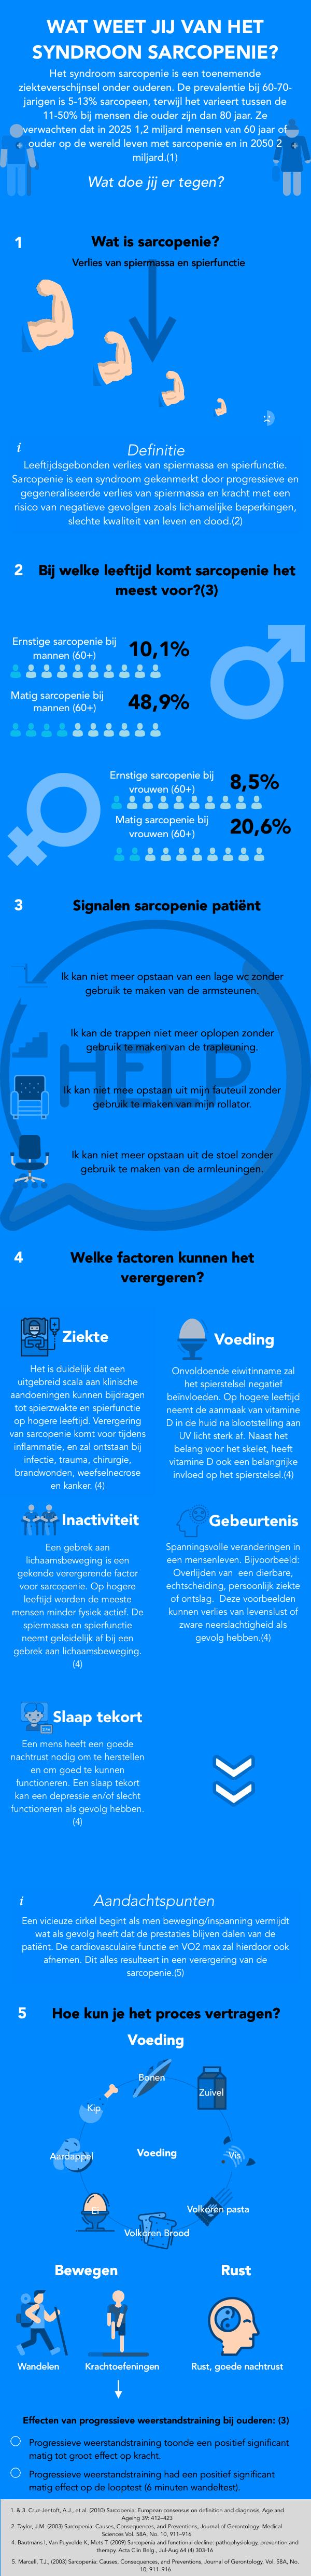 Infographic sarcopenie. Wat is sarcopenie?